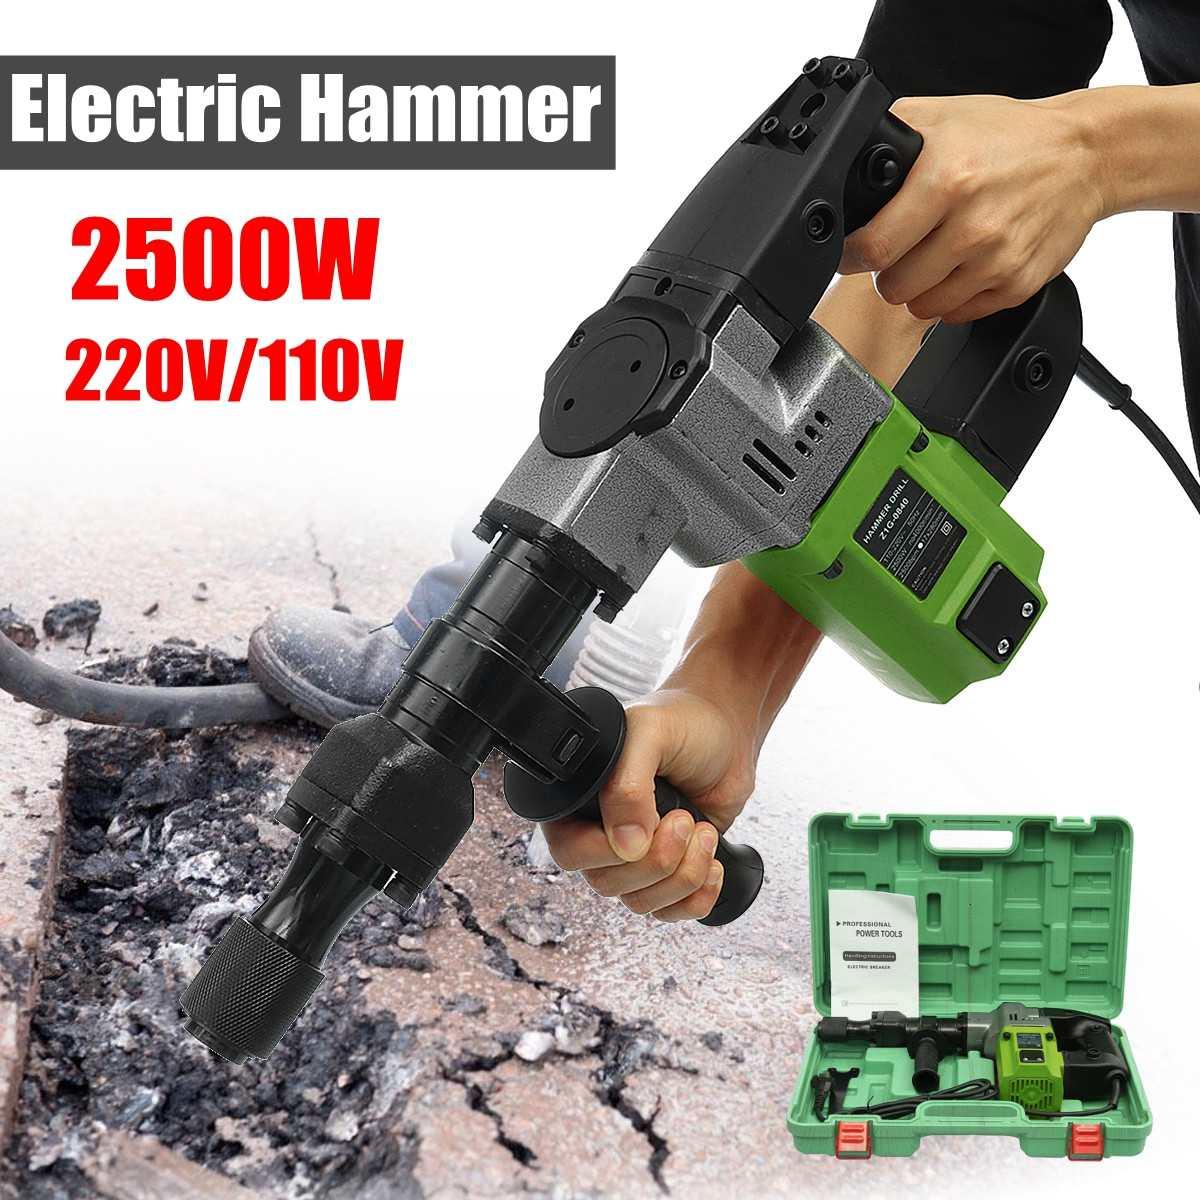 110V/120V 2500W Electric Drill Demolition Jack Hammer Rotary Jackhammer Electric Concrete Drill  2500BPM 4000r/min